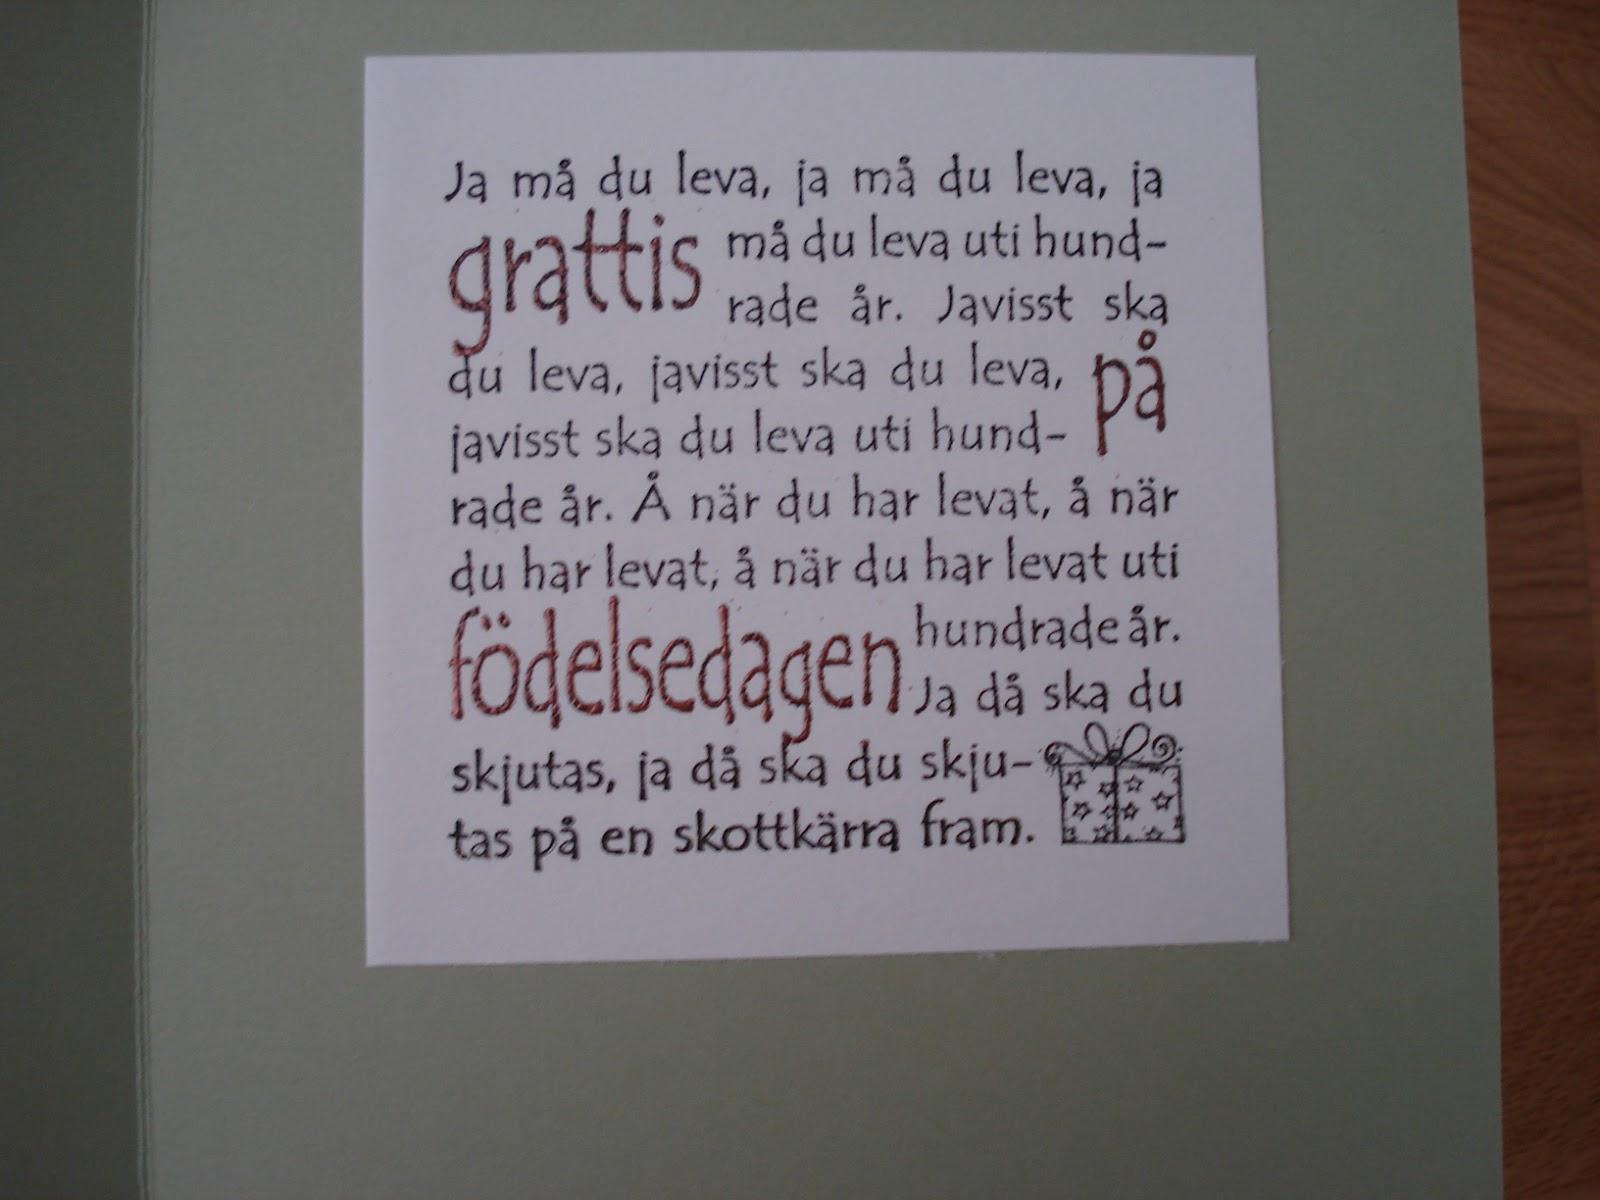 födelsedags grattis text Elmsteins pyssel: Grattis bröder! födelsedags grattis text